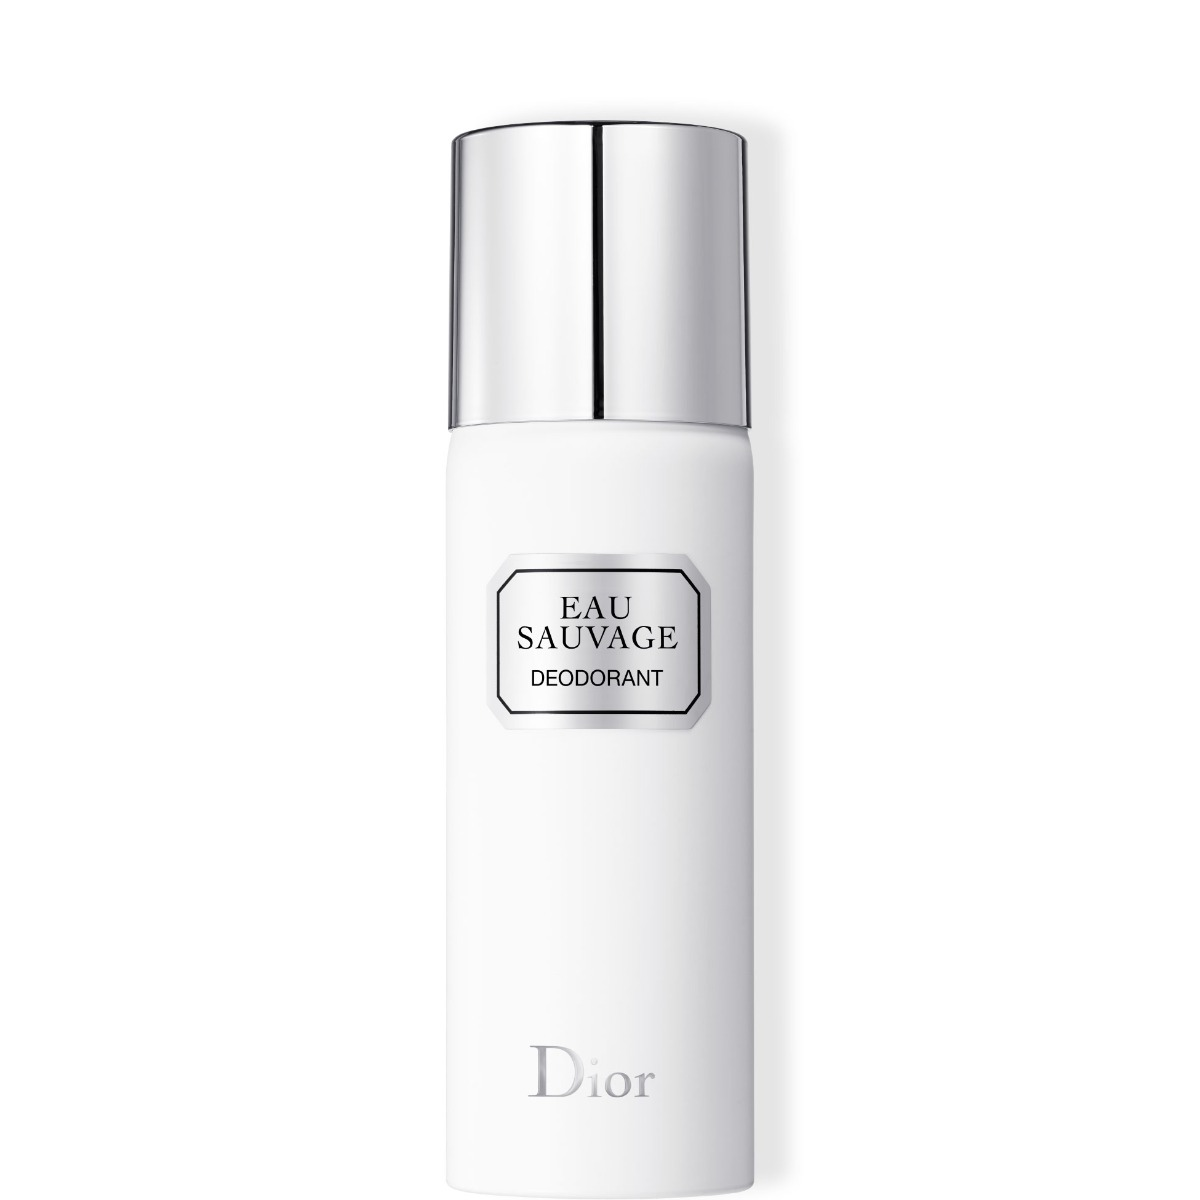 Afbeelding van Christian Dior Eau Sauvage Deodorant 150 ml